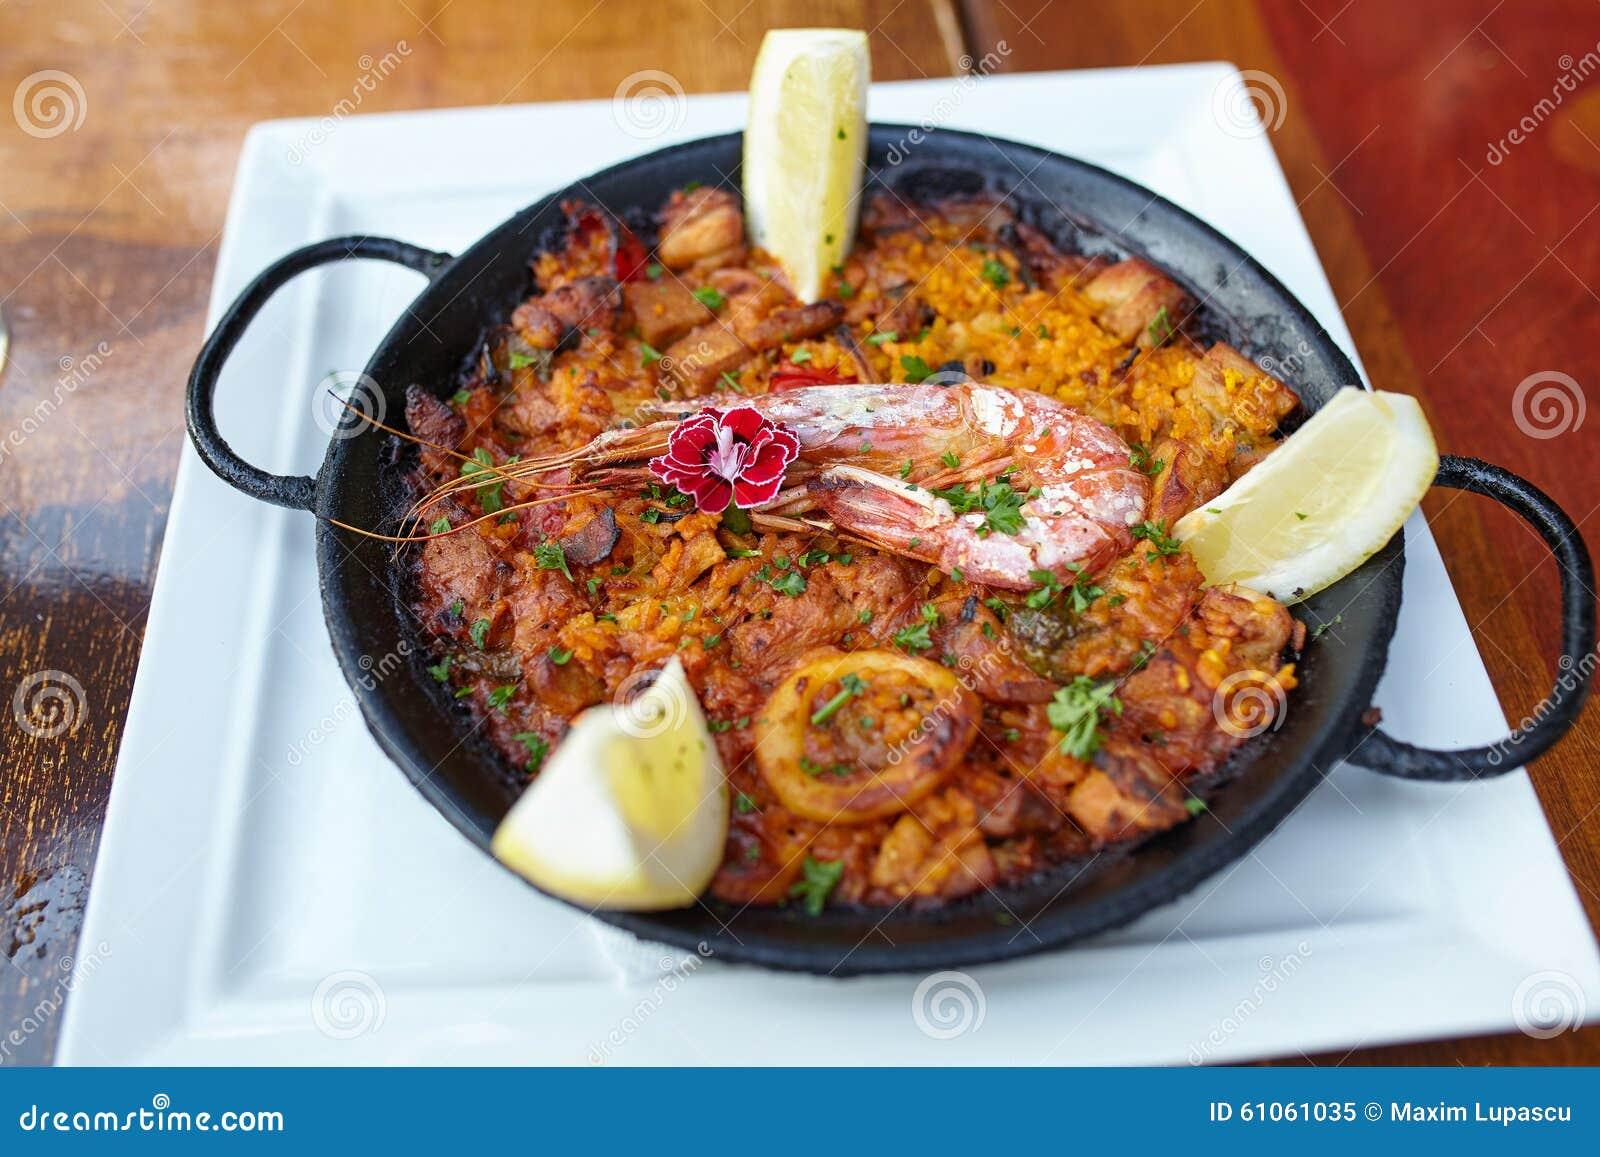 Typical spanish seafood paella dish